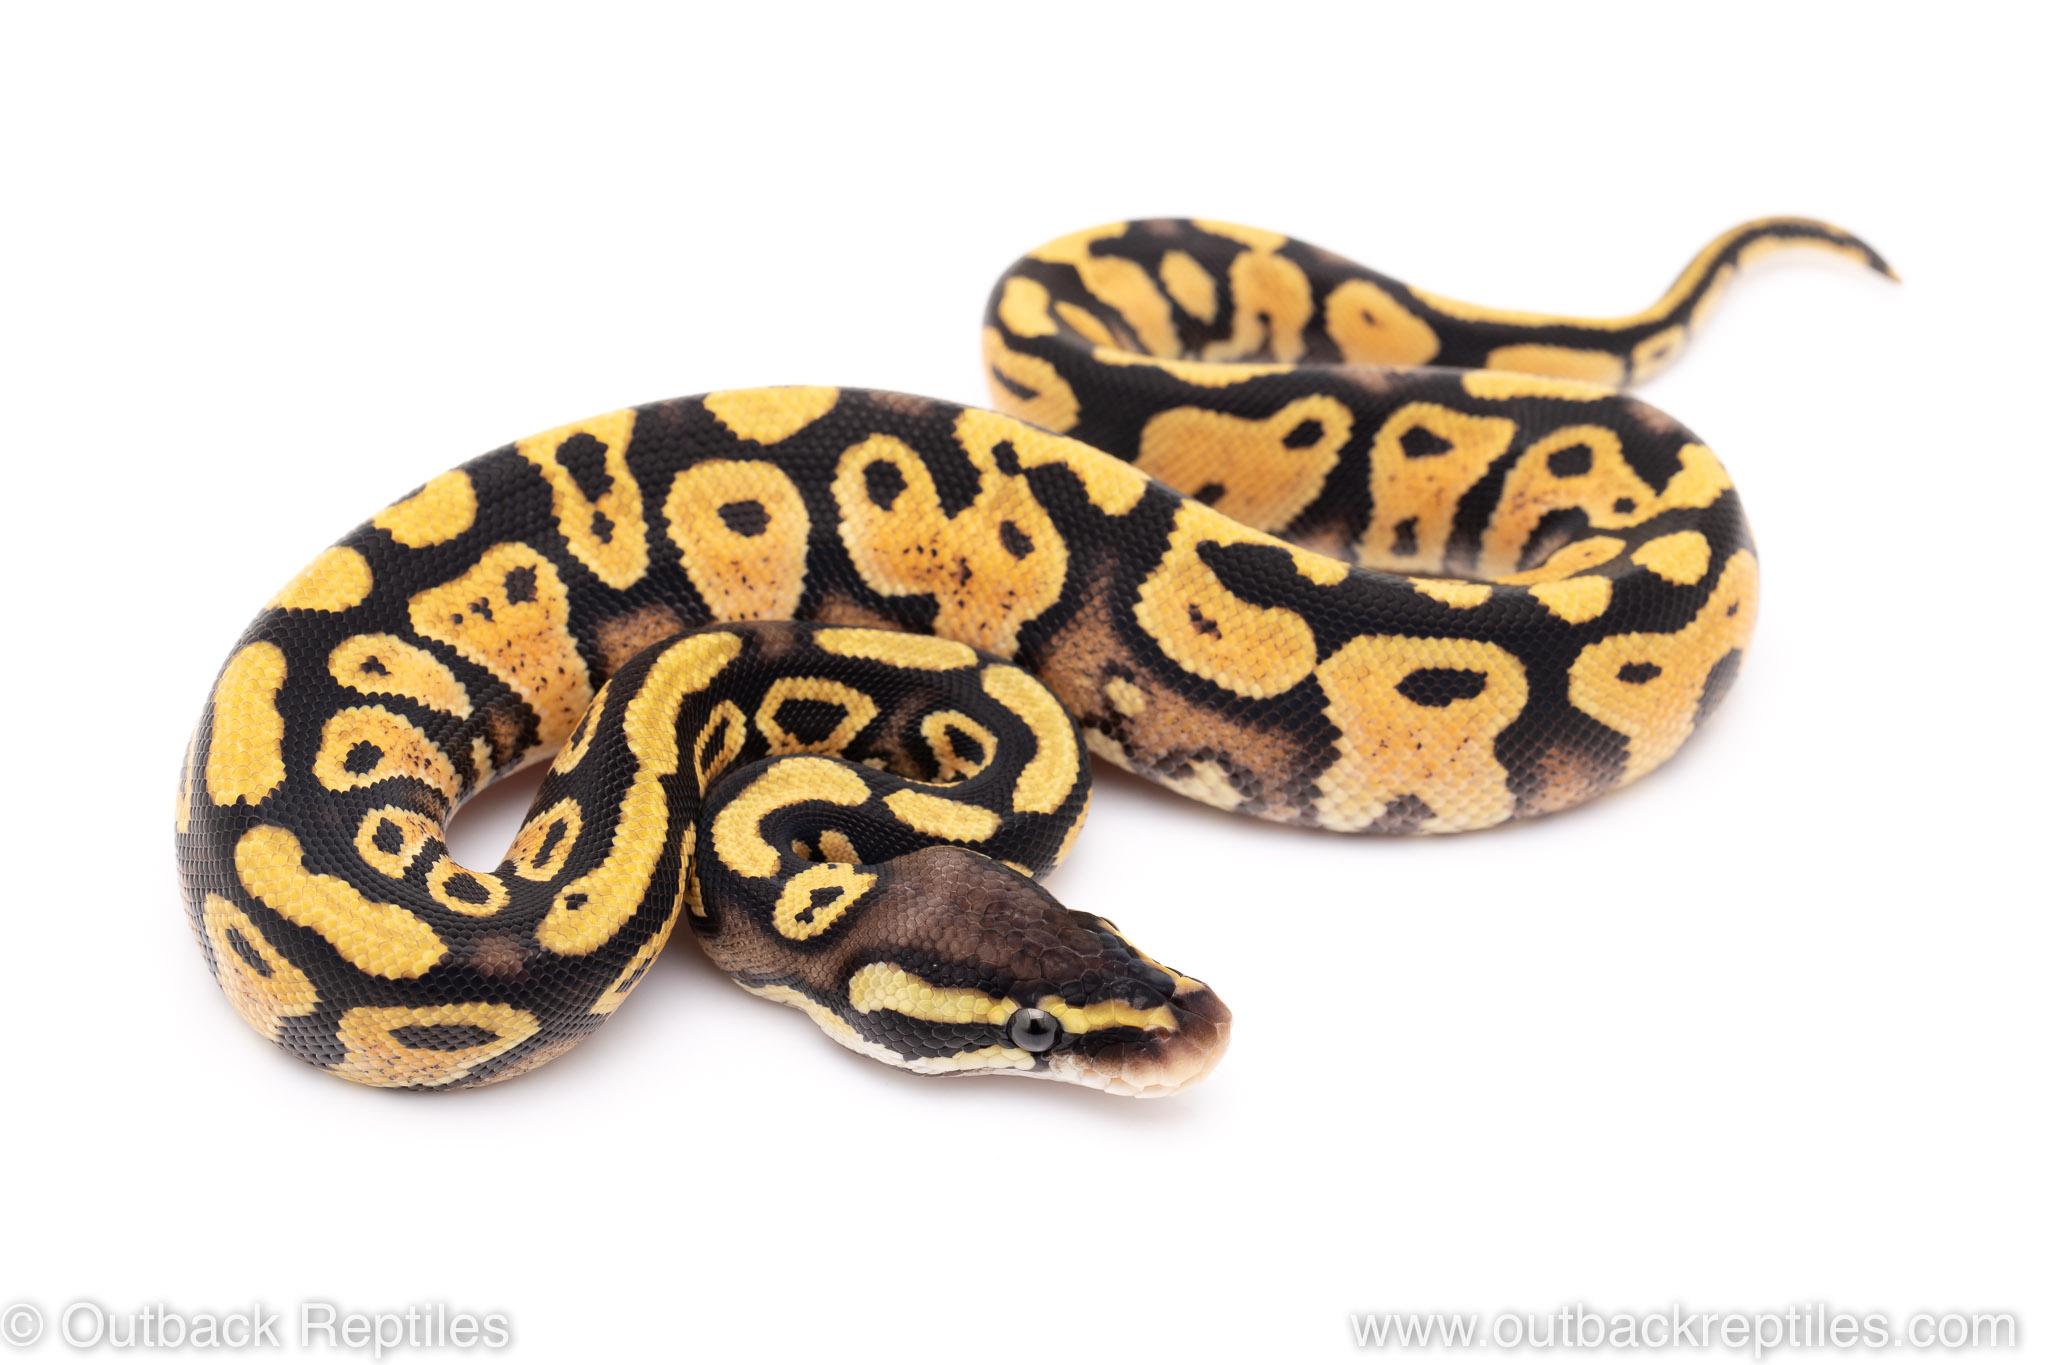 Pastel yellowbelly orange dream ball python for sale